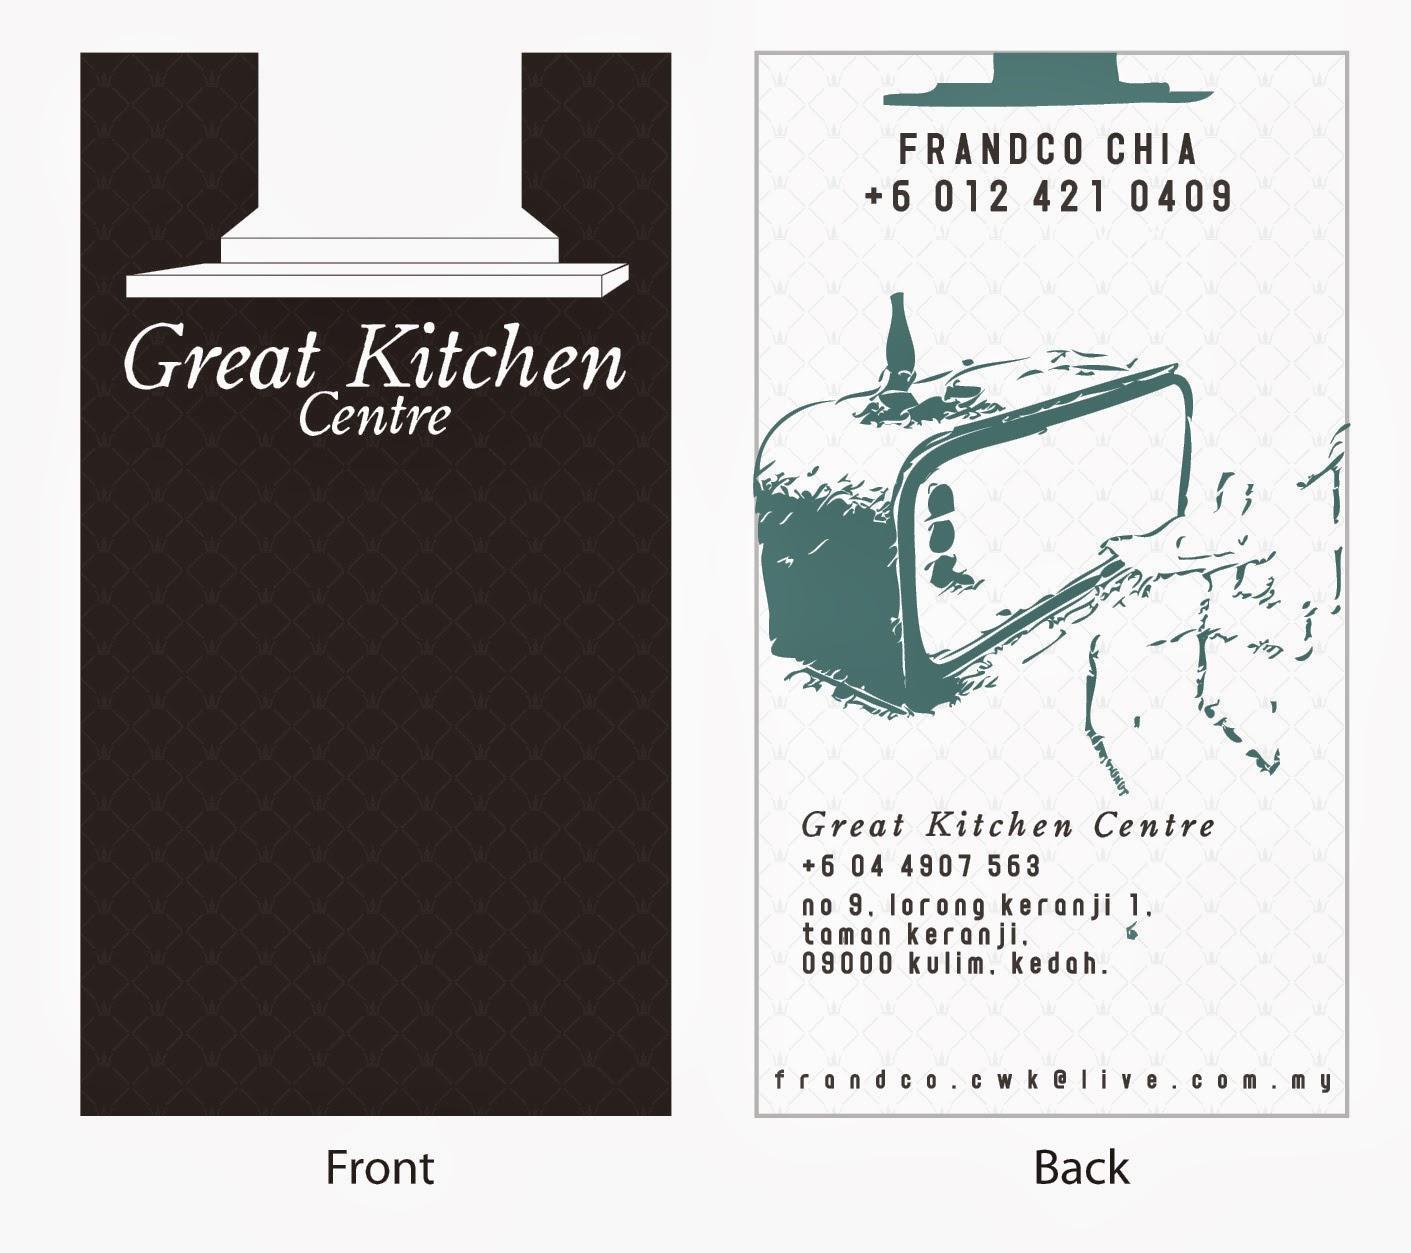 K s design 2010 Great Kitchen Centre s Business Card design